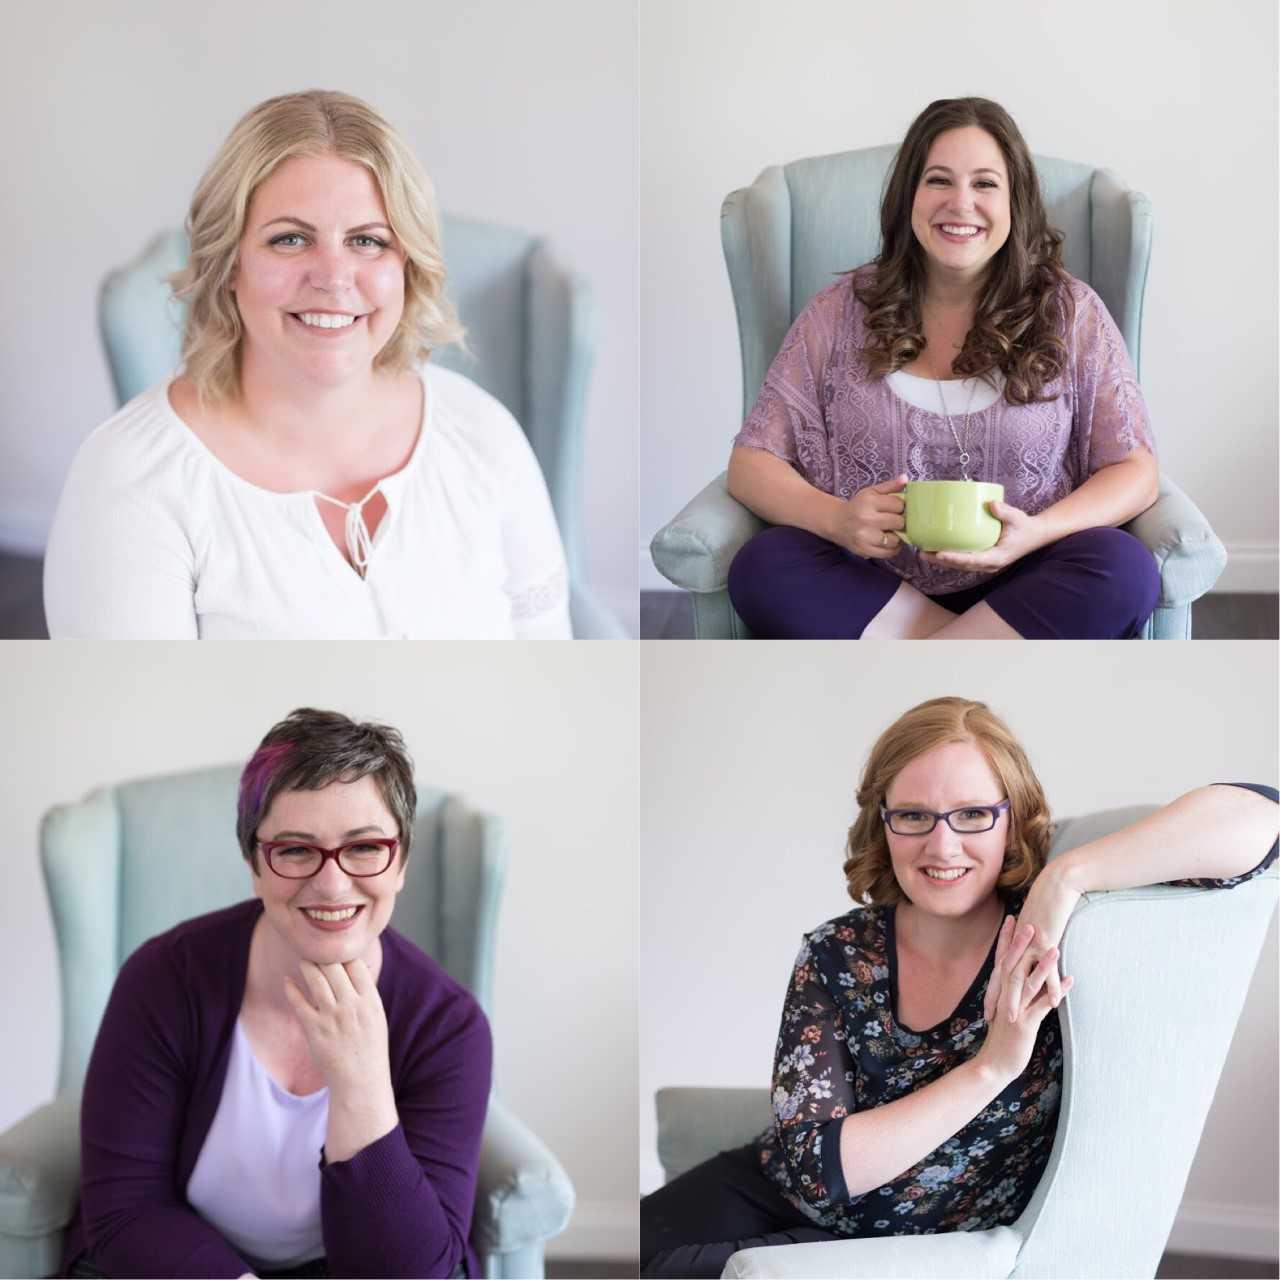 FIVE ELEMENTS BIRTH SERVICES